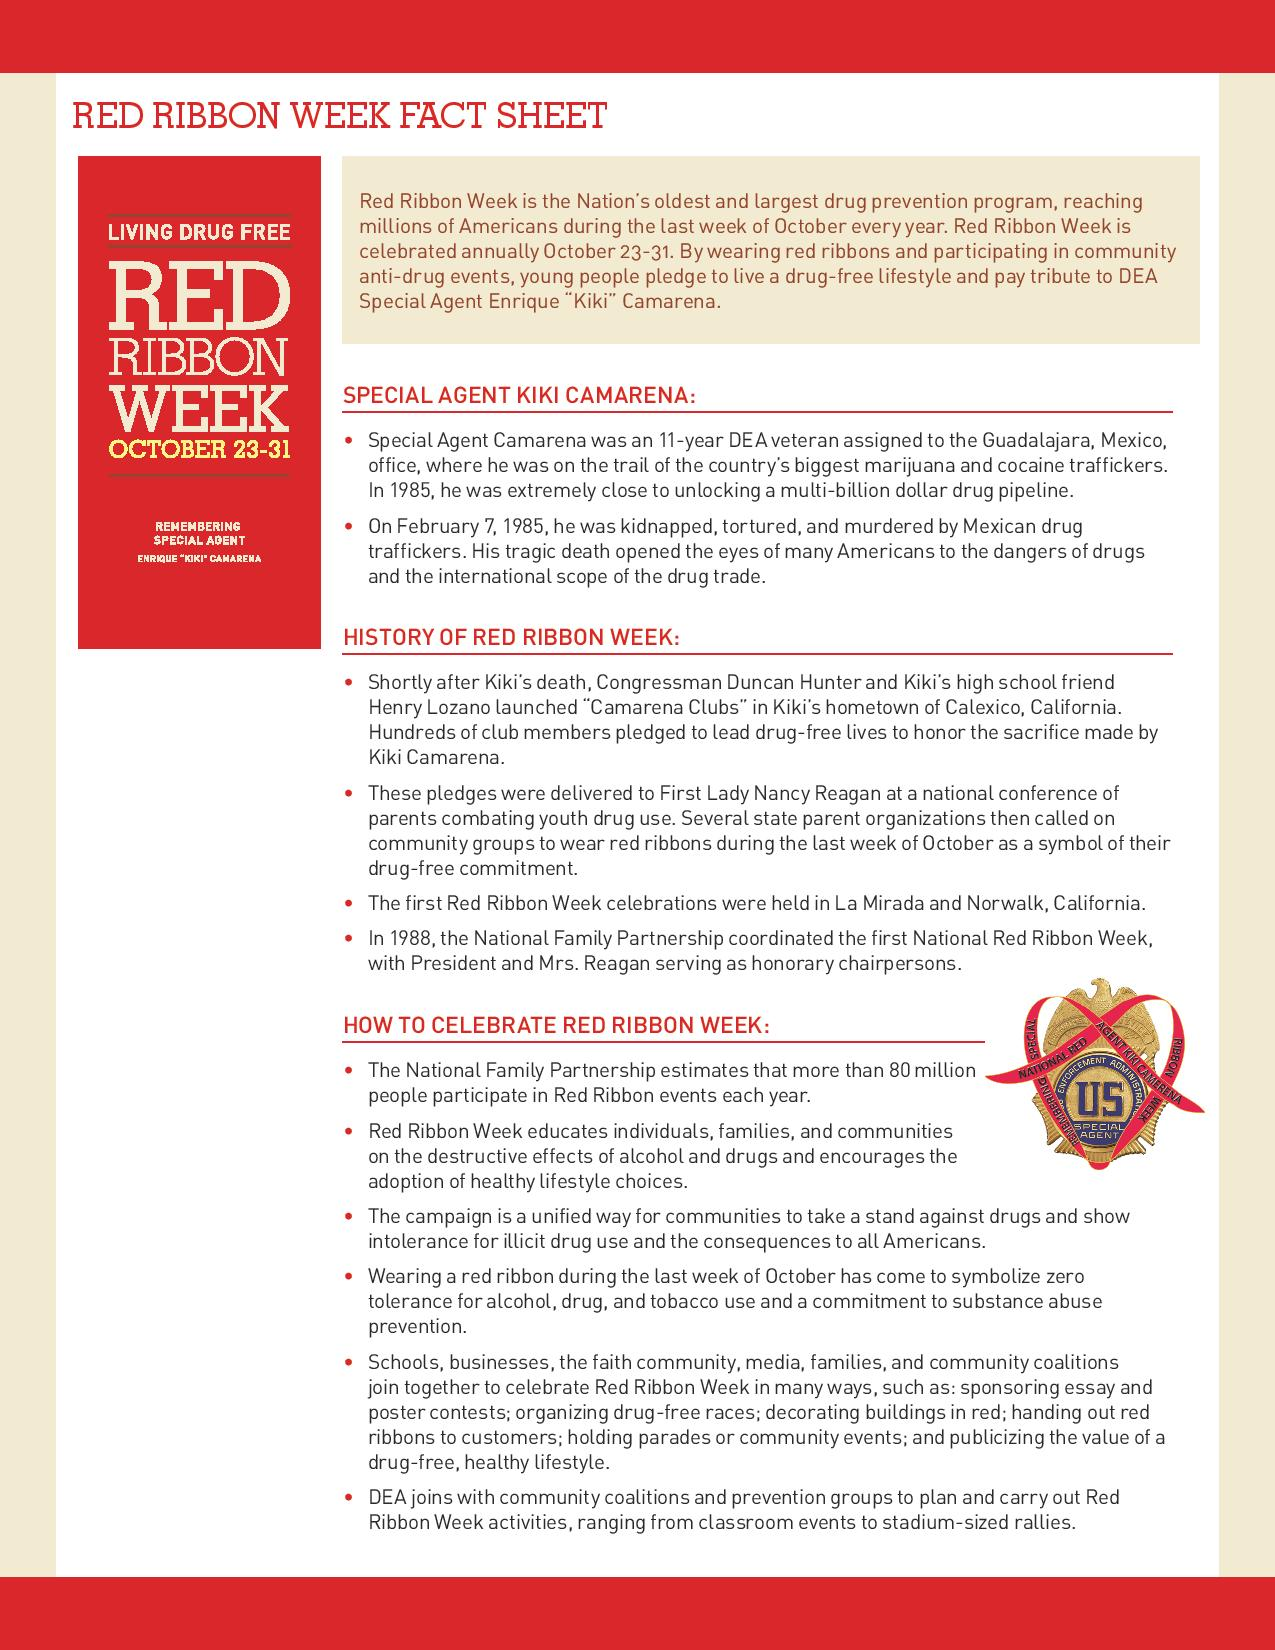 Red-Ribbon-Fact-Sheet-page-001.jpg